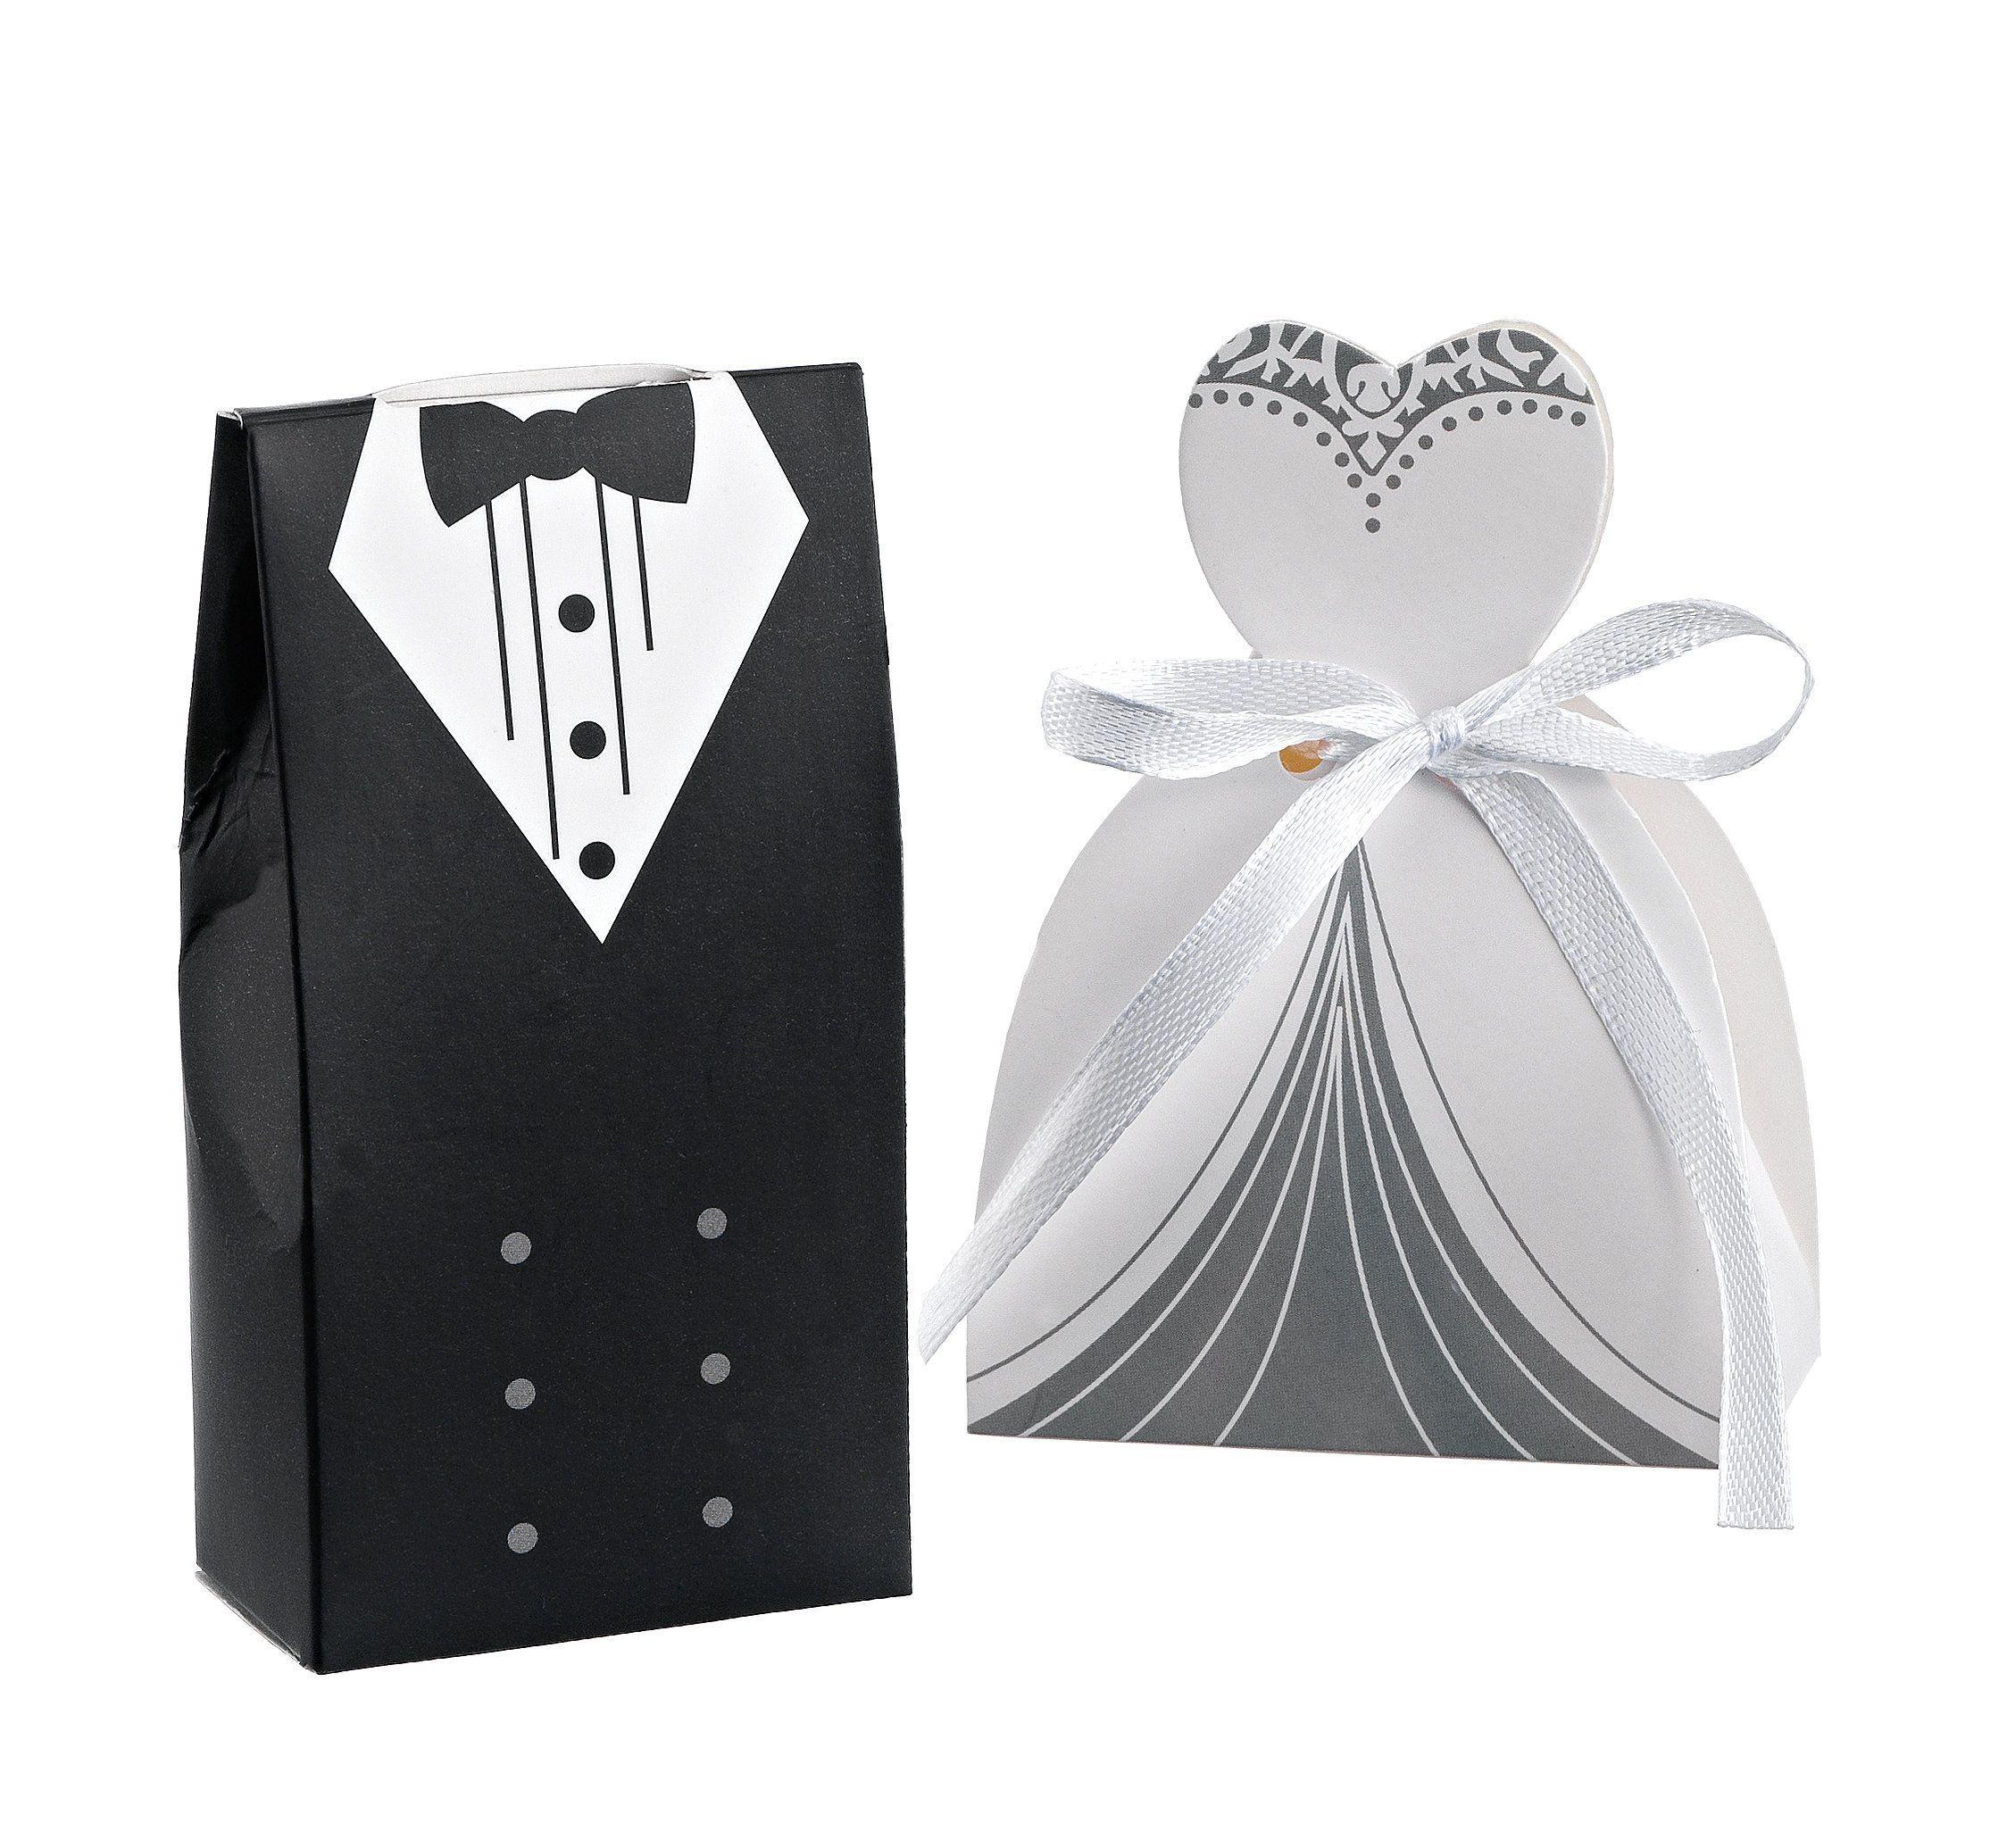 Groom Bride Wedding Favors 20-200 Box Favors Bridal Party